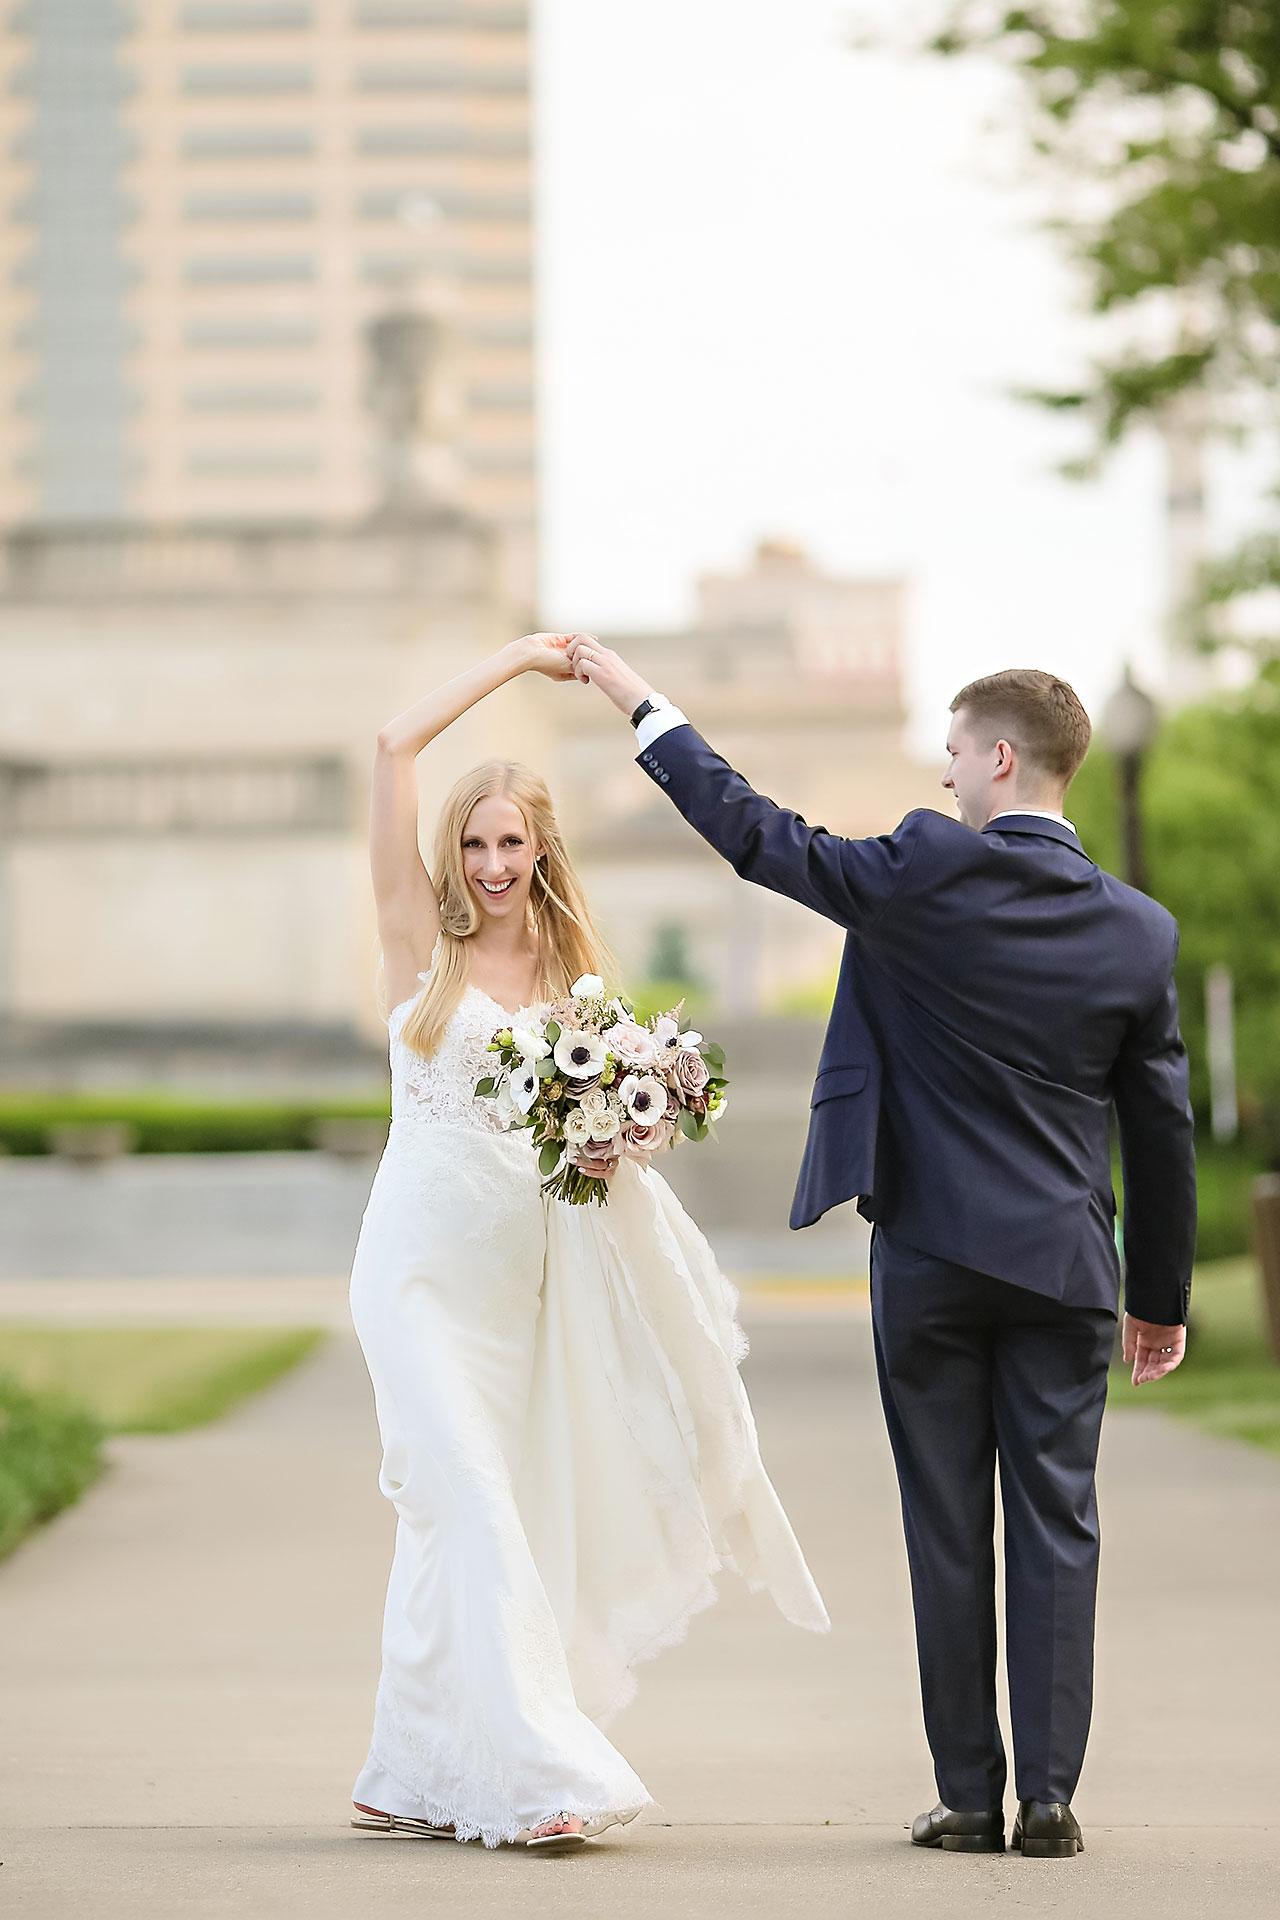 Molly Declan Scottish Rite Indianapolis Wedding 171